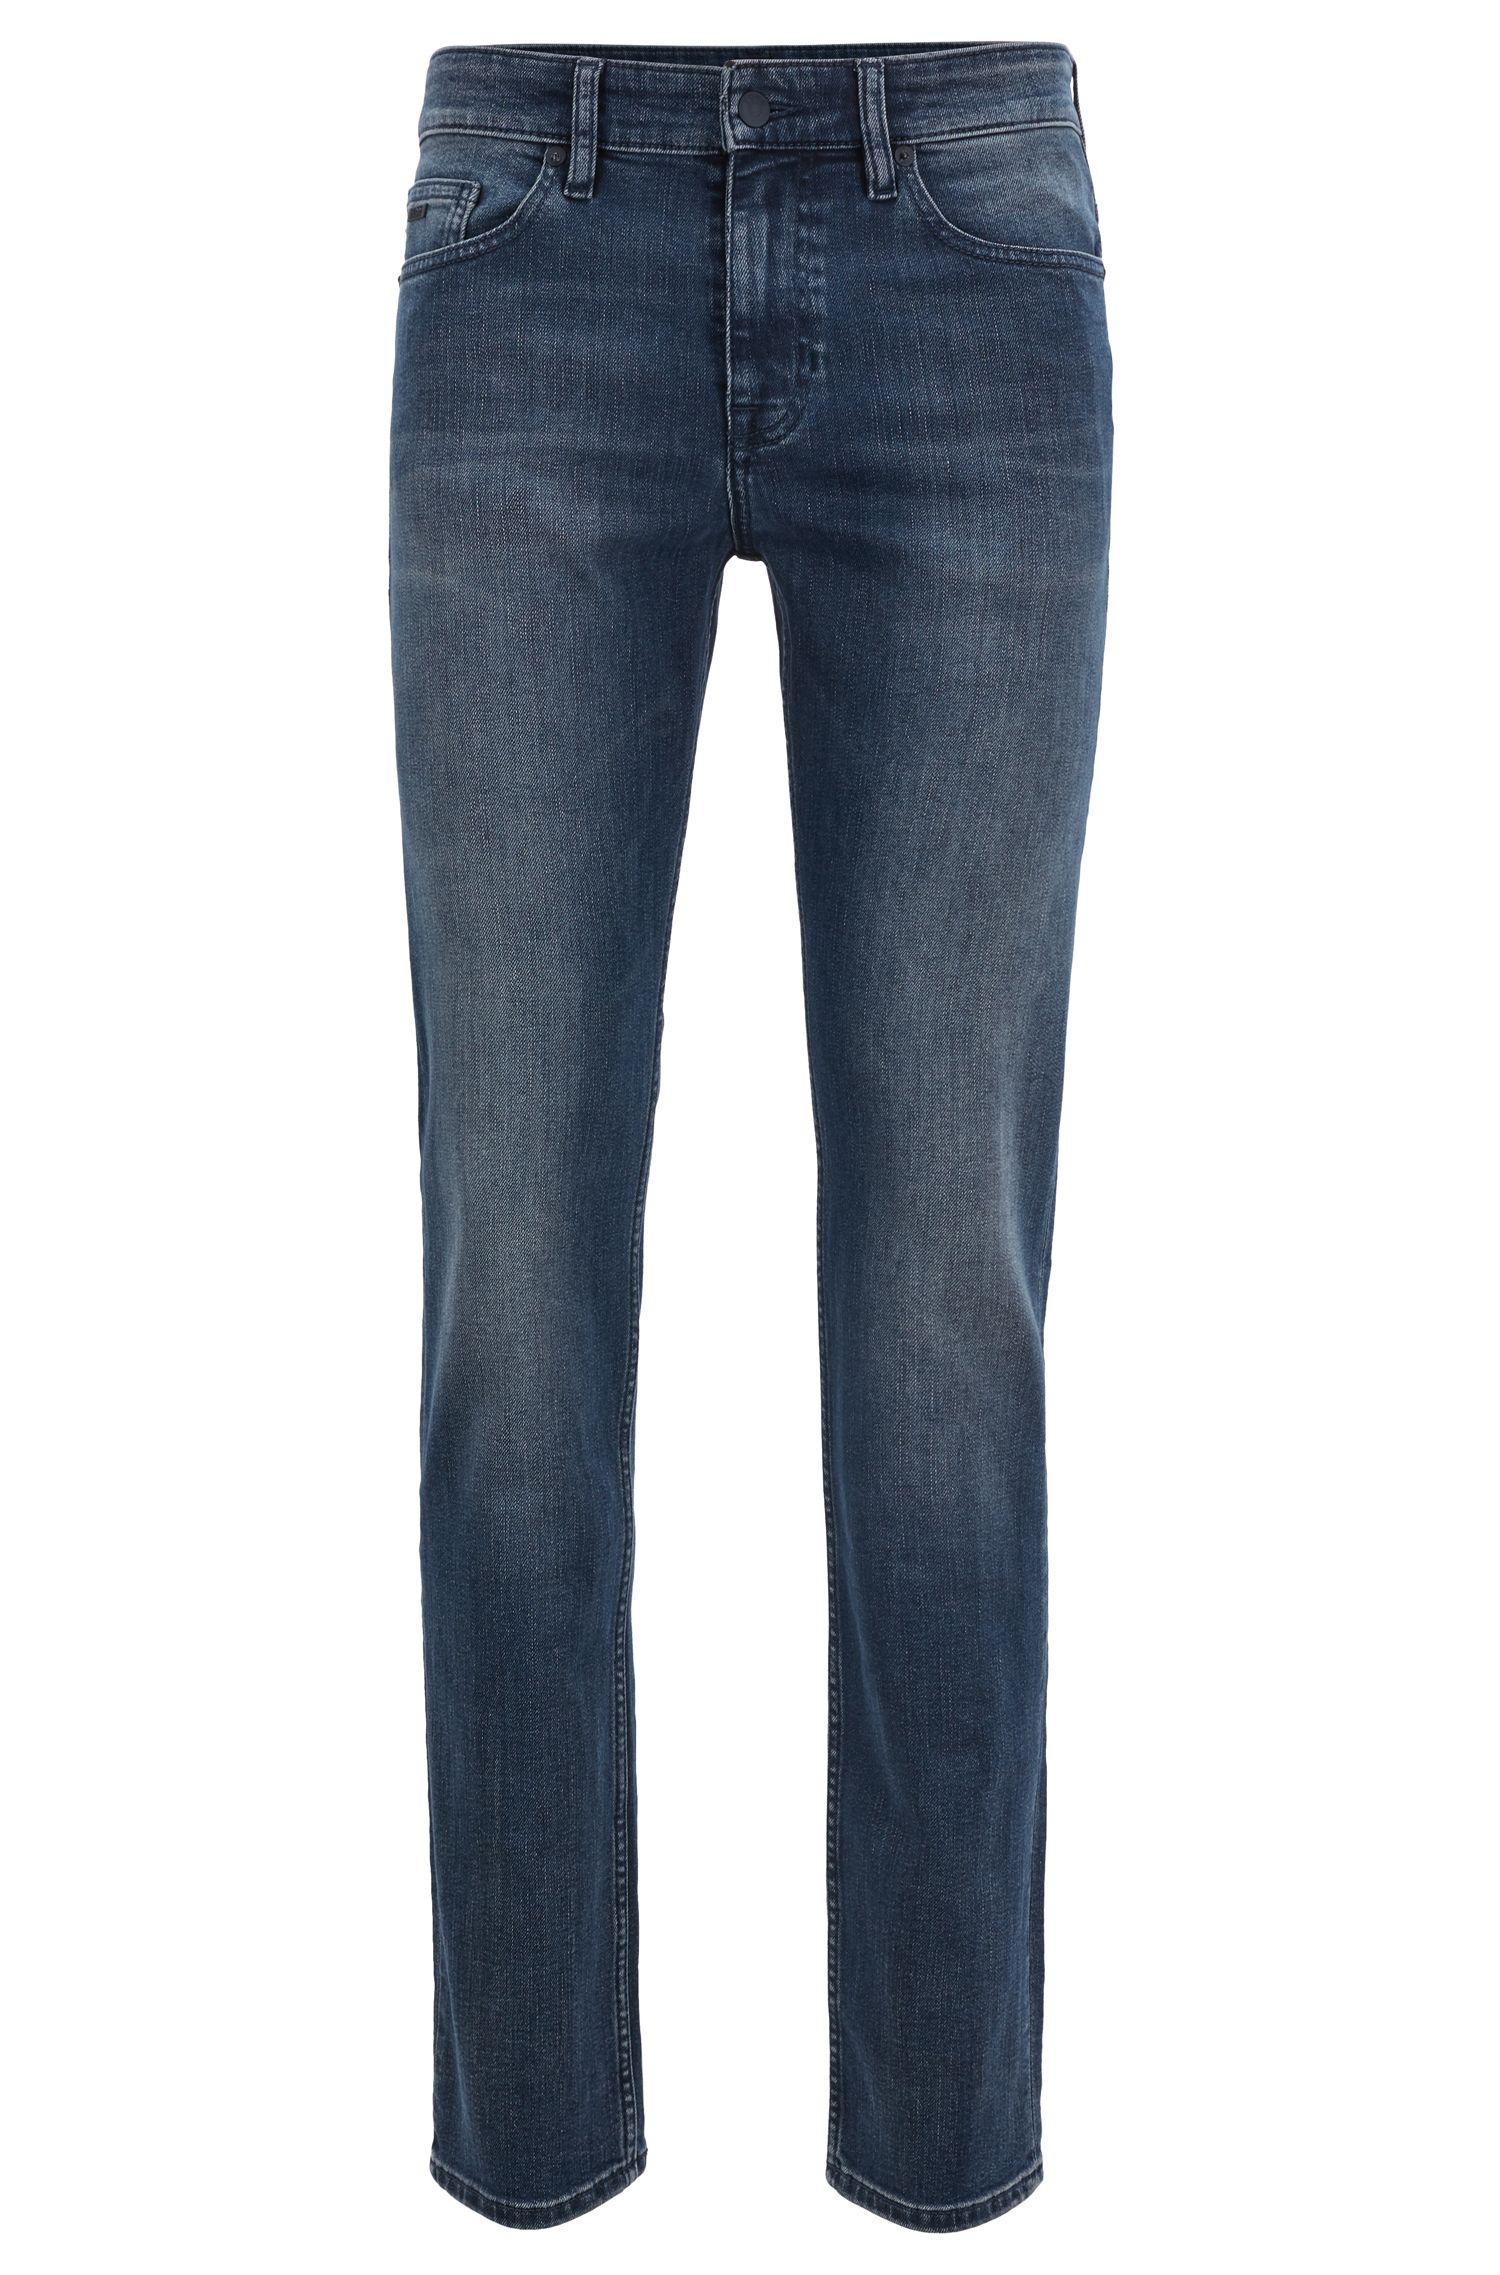 Slim-fit jeans in soft-washed comfort-stretch denim, Blue